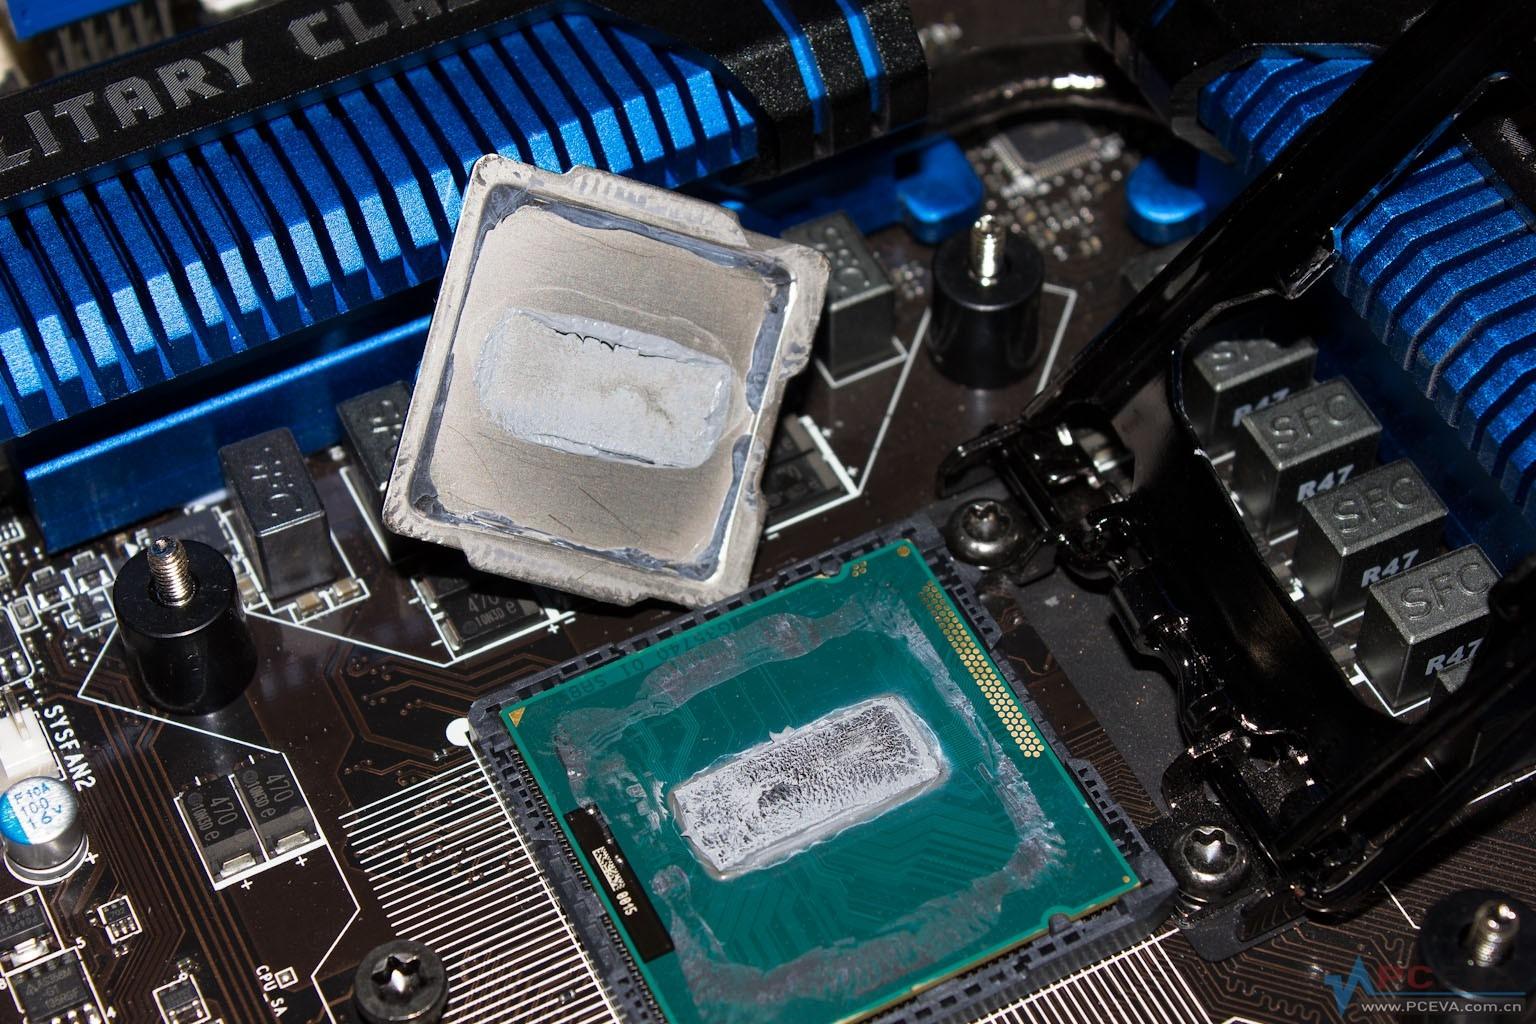 Intels Ivy Bridge Core I7 3770K Overheating Issue Detailed